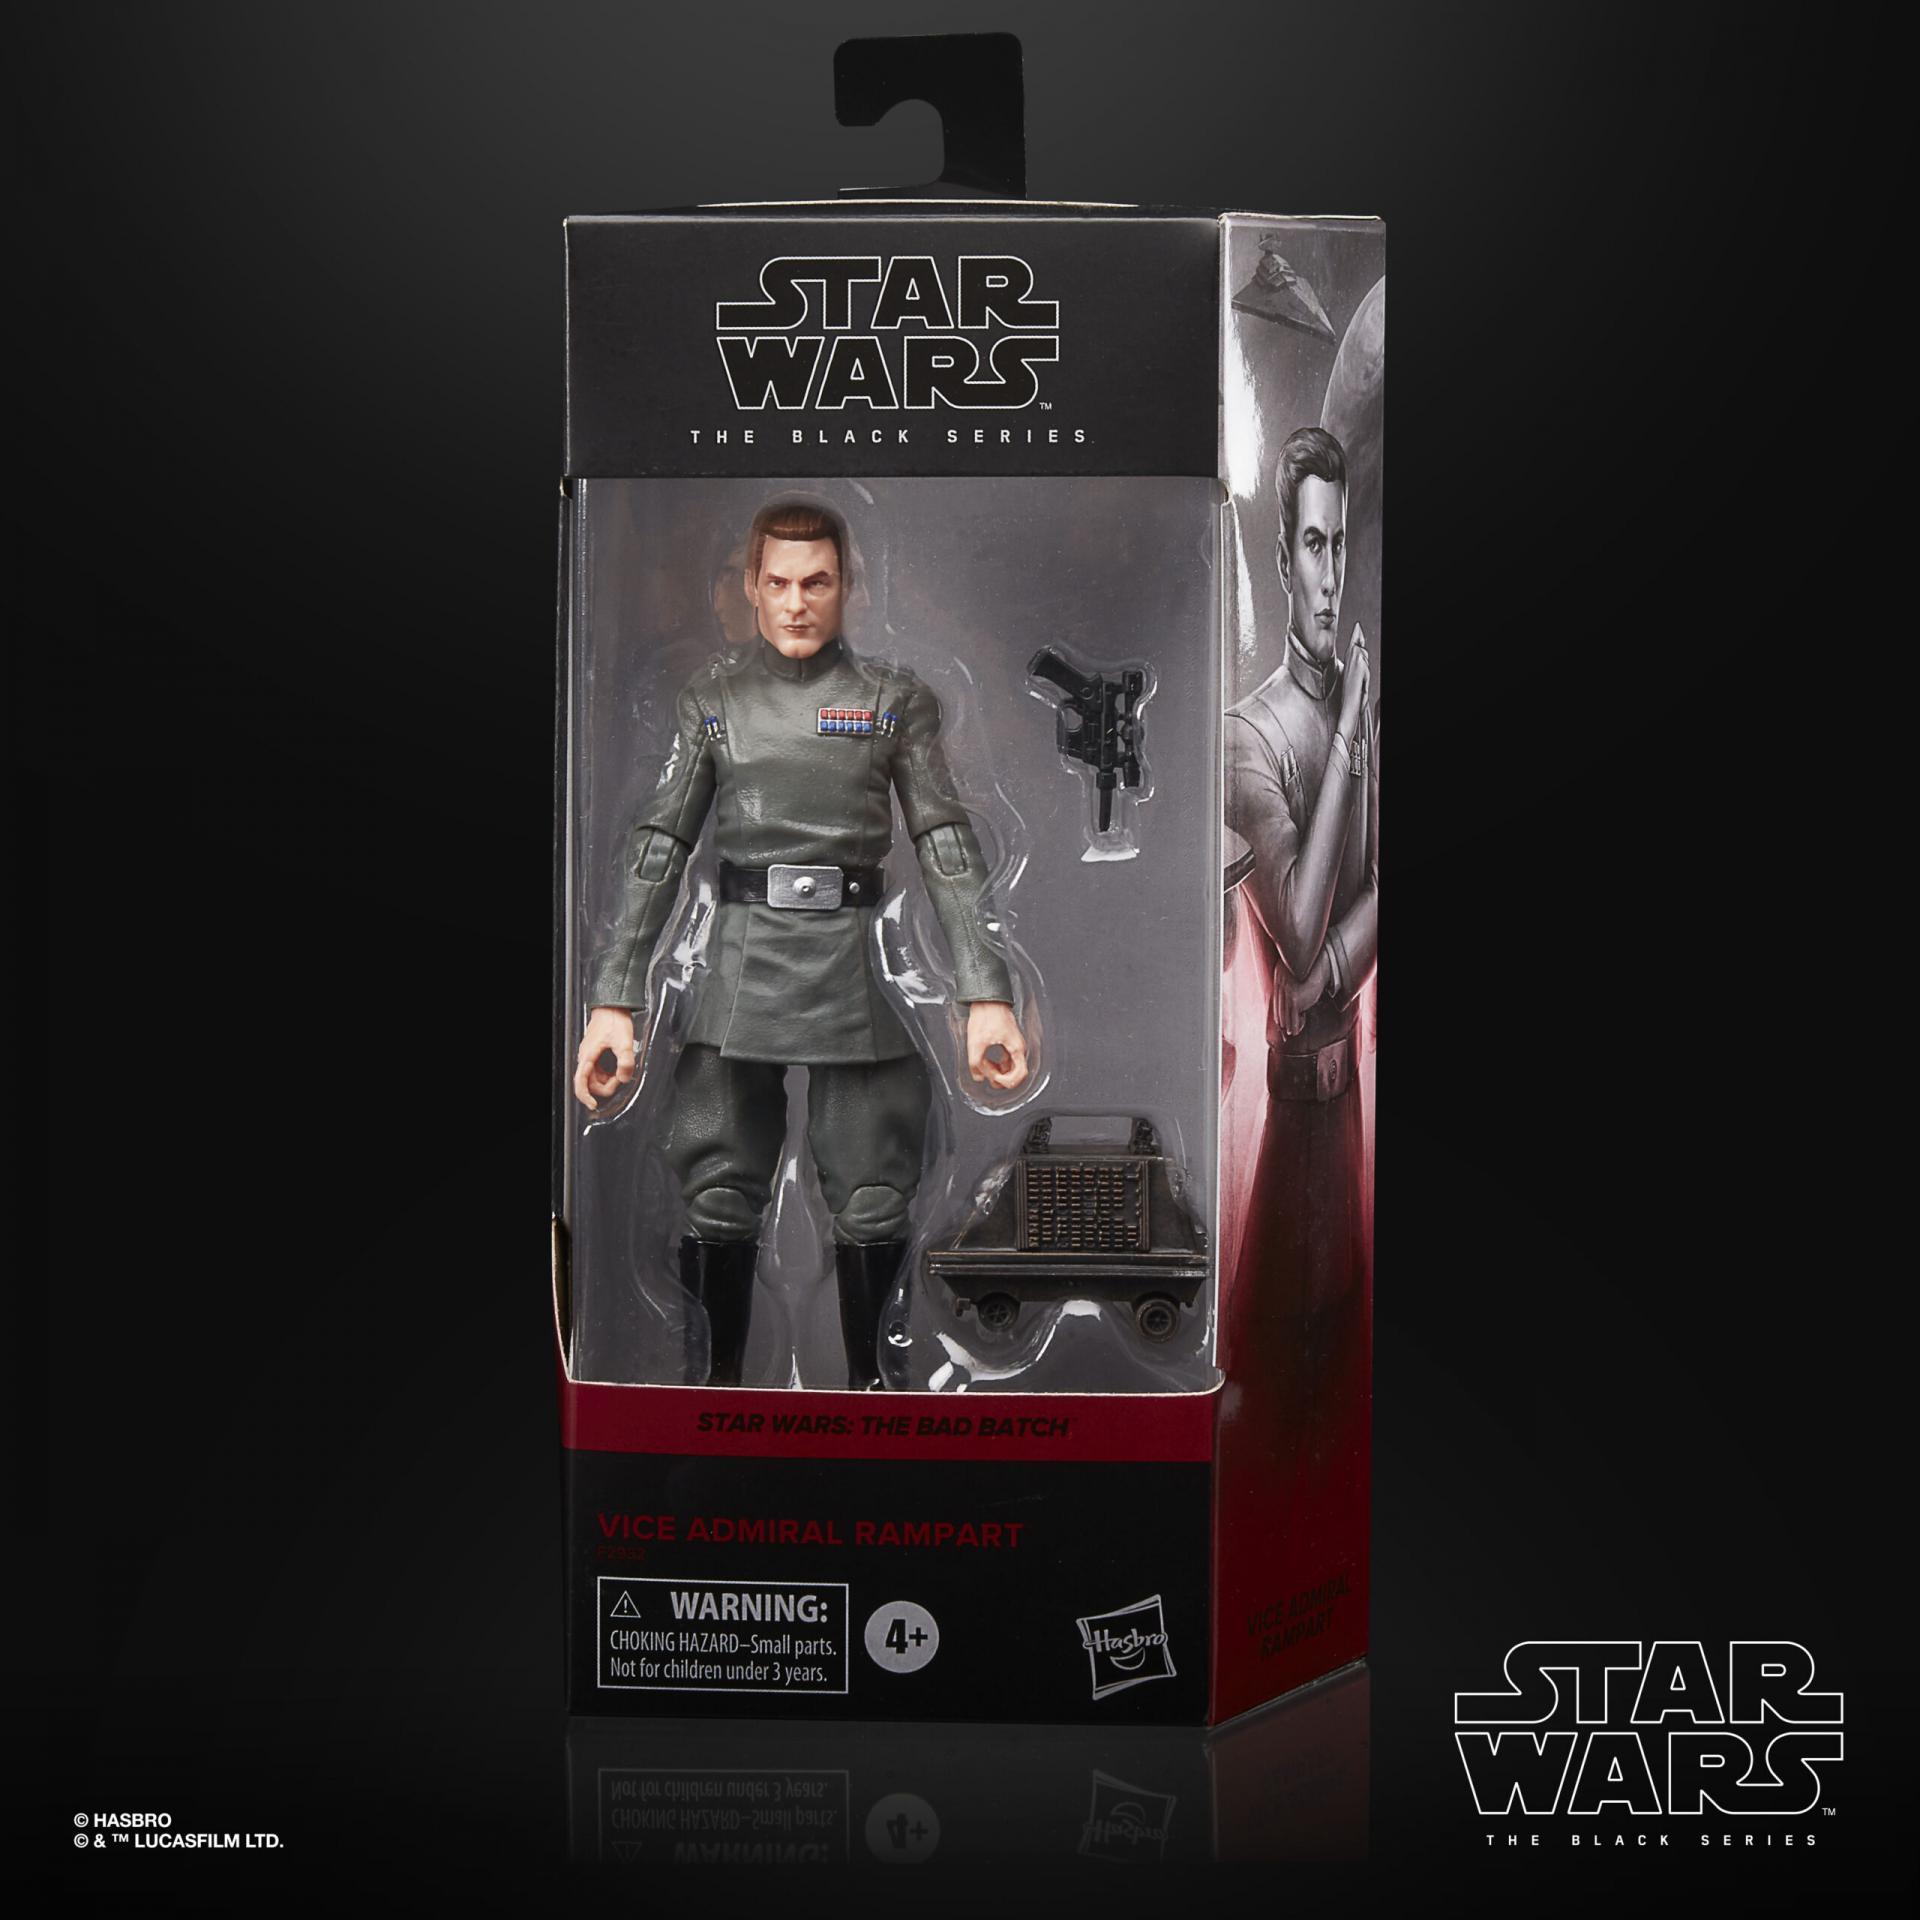 Star wars the black series vice admiral rampart 15cm